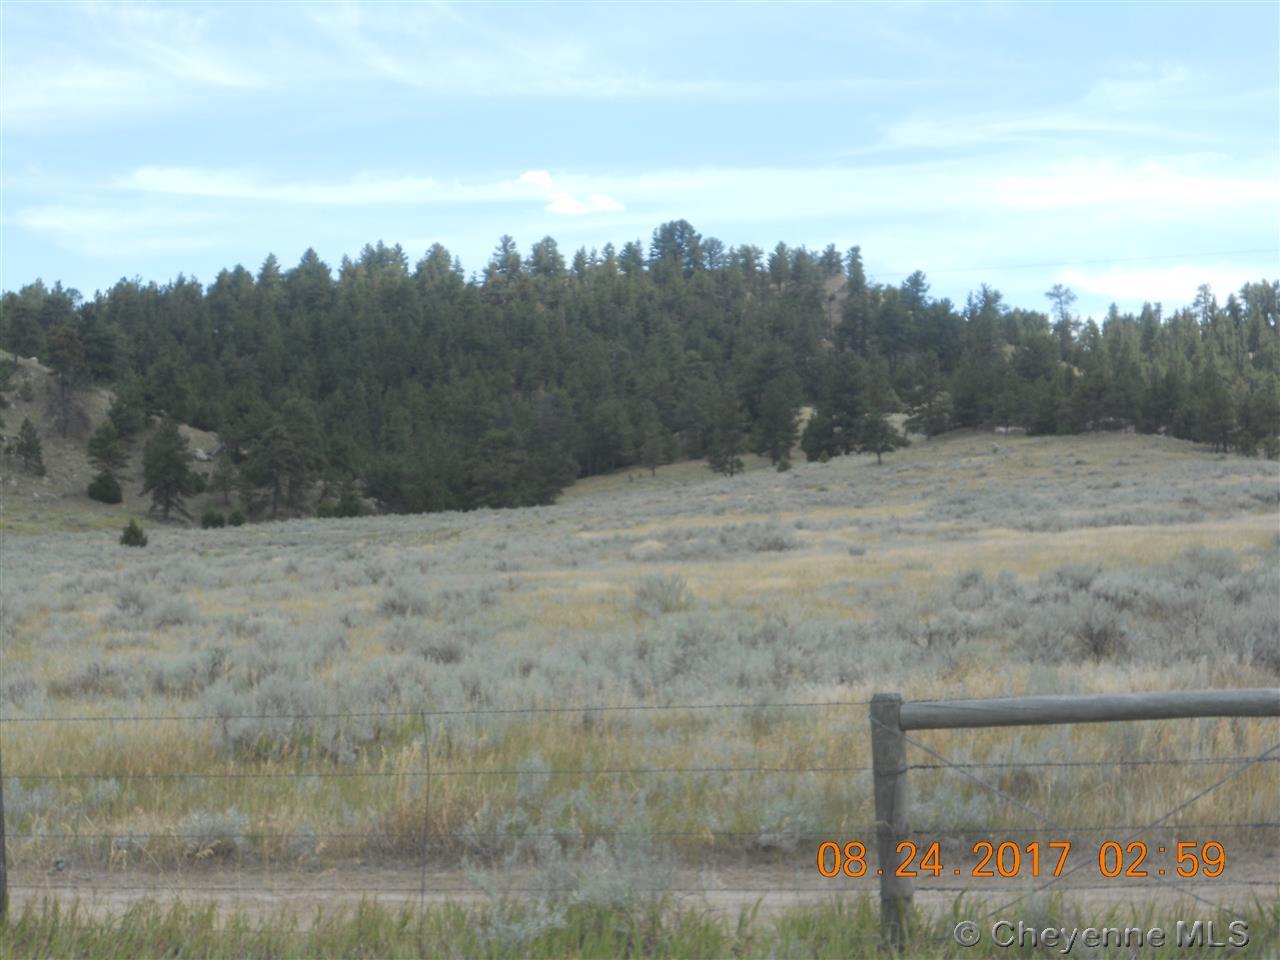 Land for Sale at 170 S Glendo Hwy 170 S Glendo Hwy Glendo, Wyoming 82213 United States